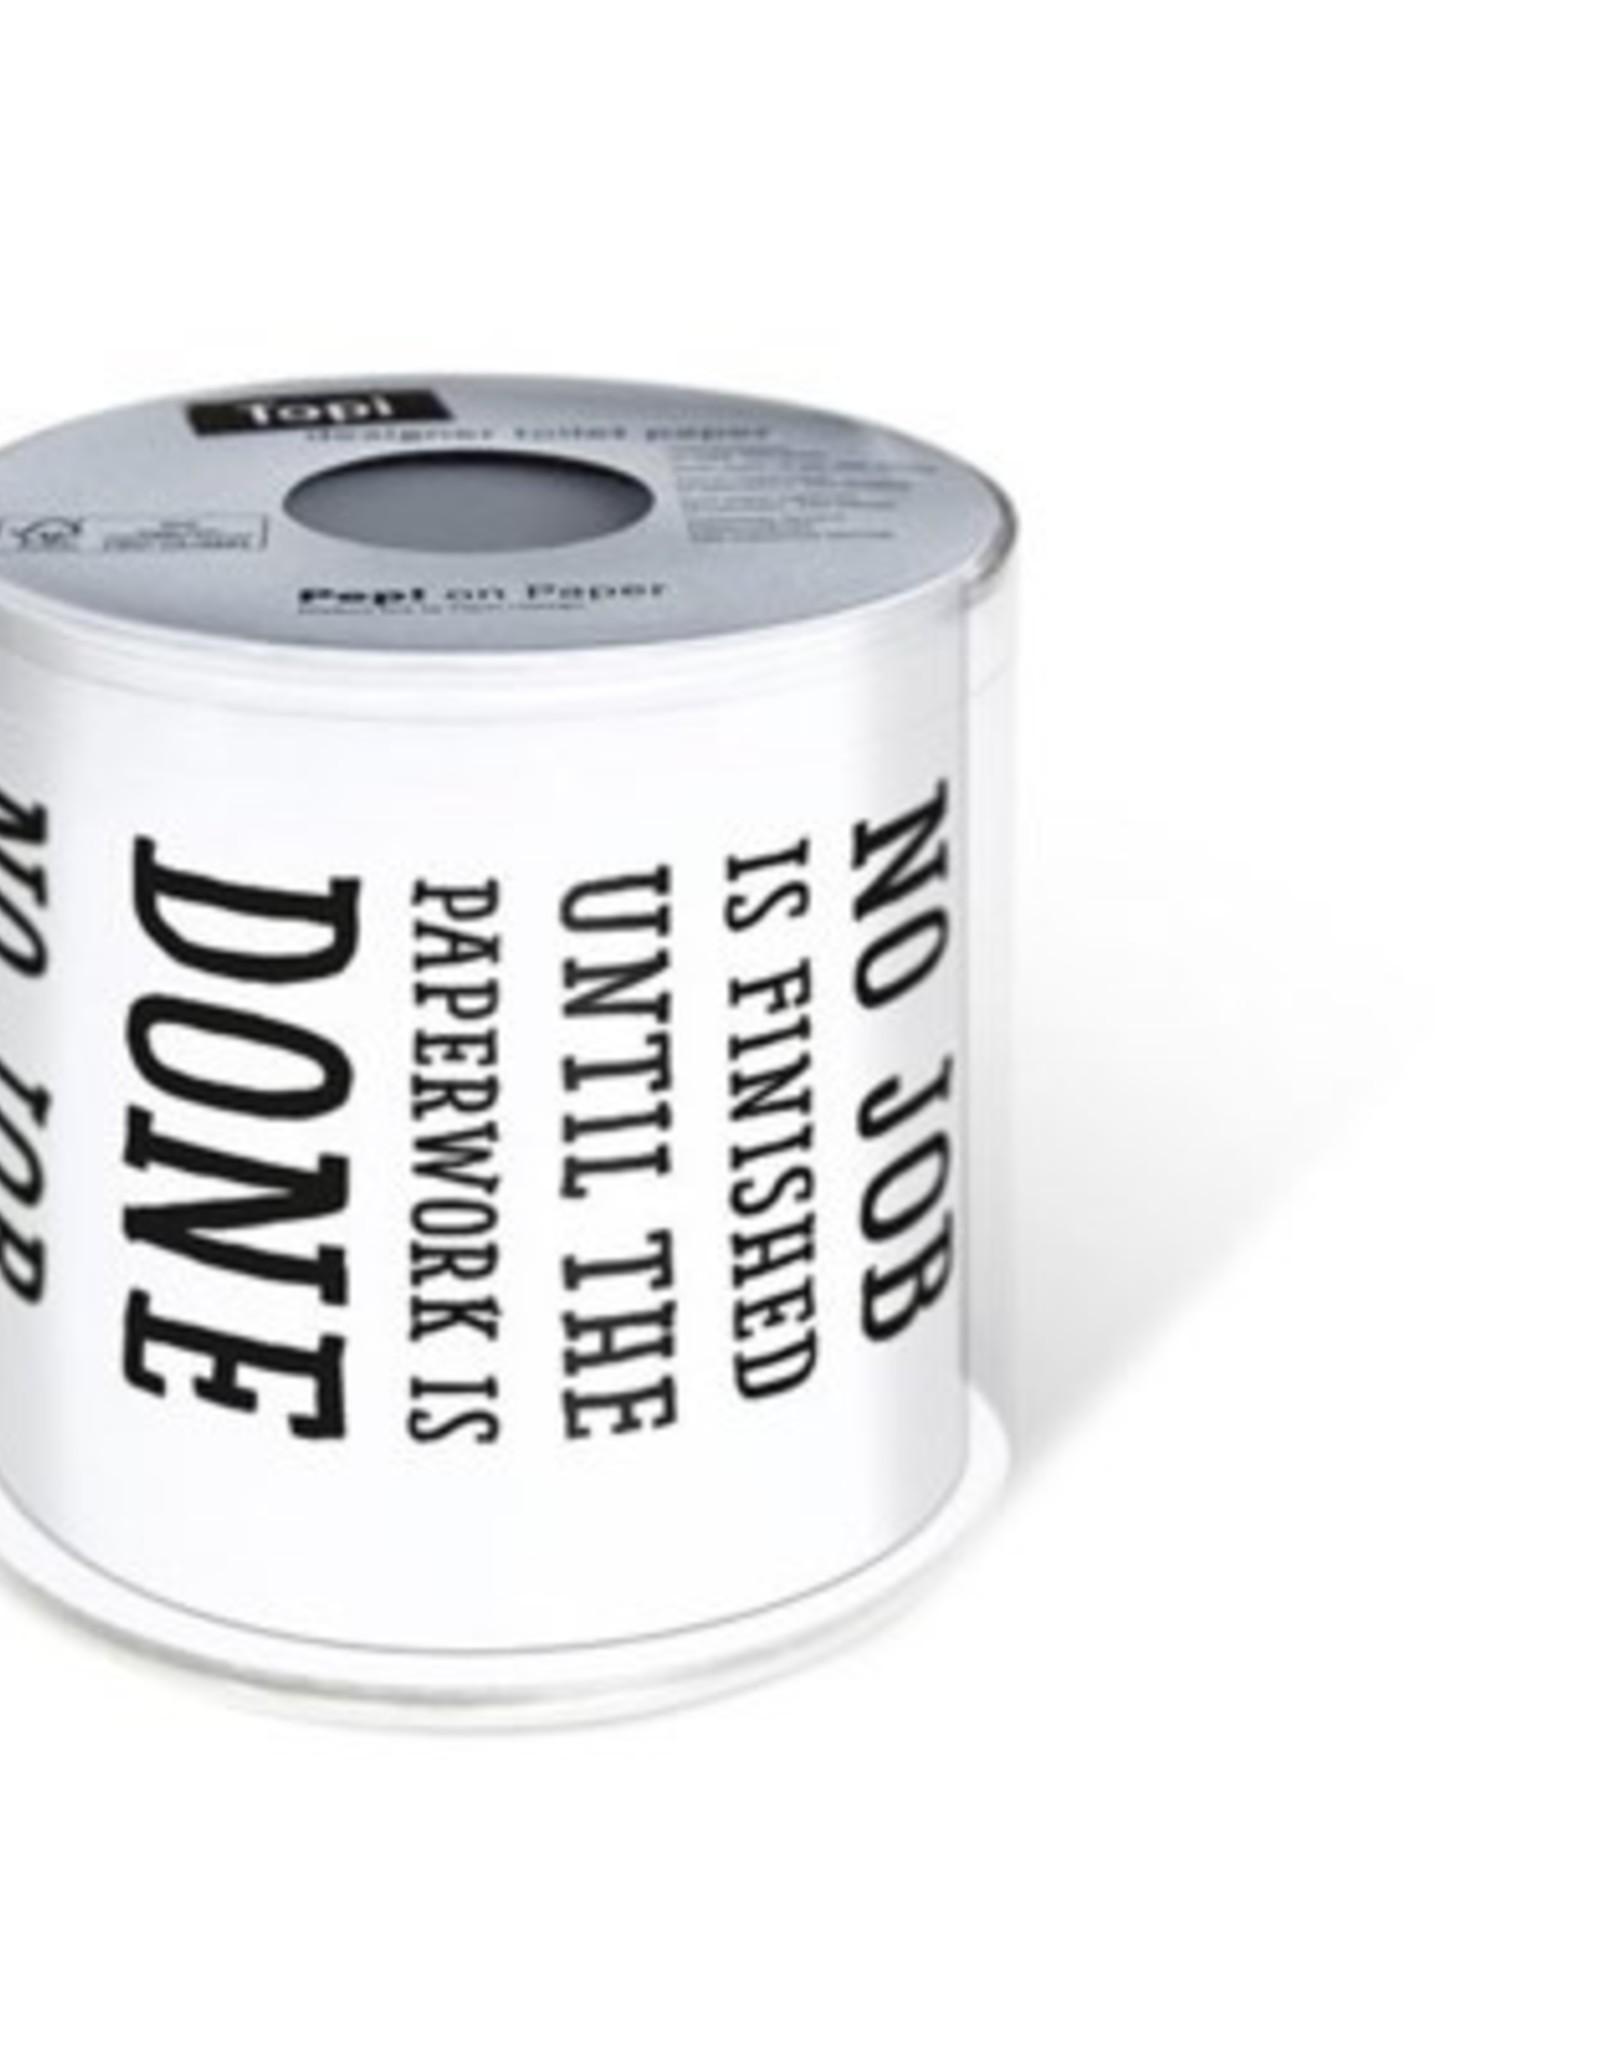 Toilet Paper OCD Designer Paperwork TP229